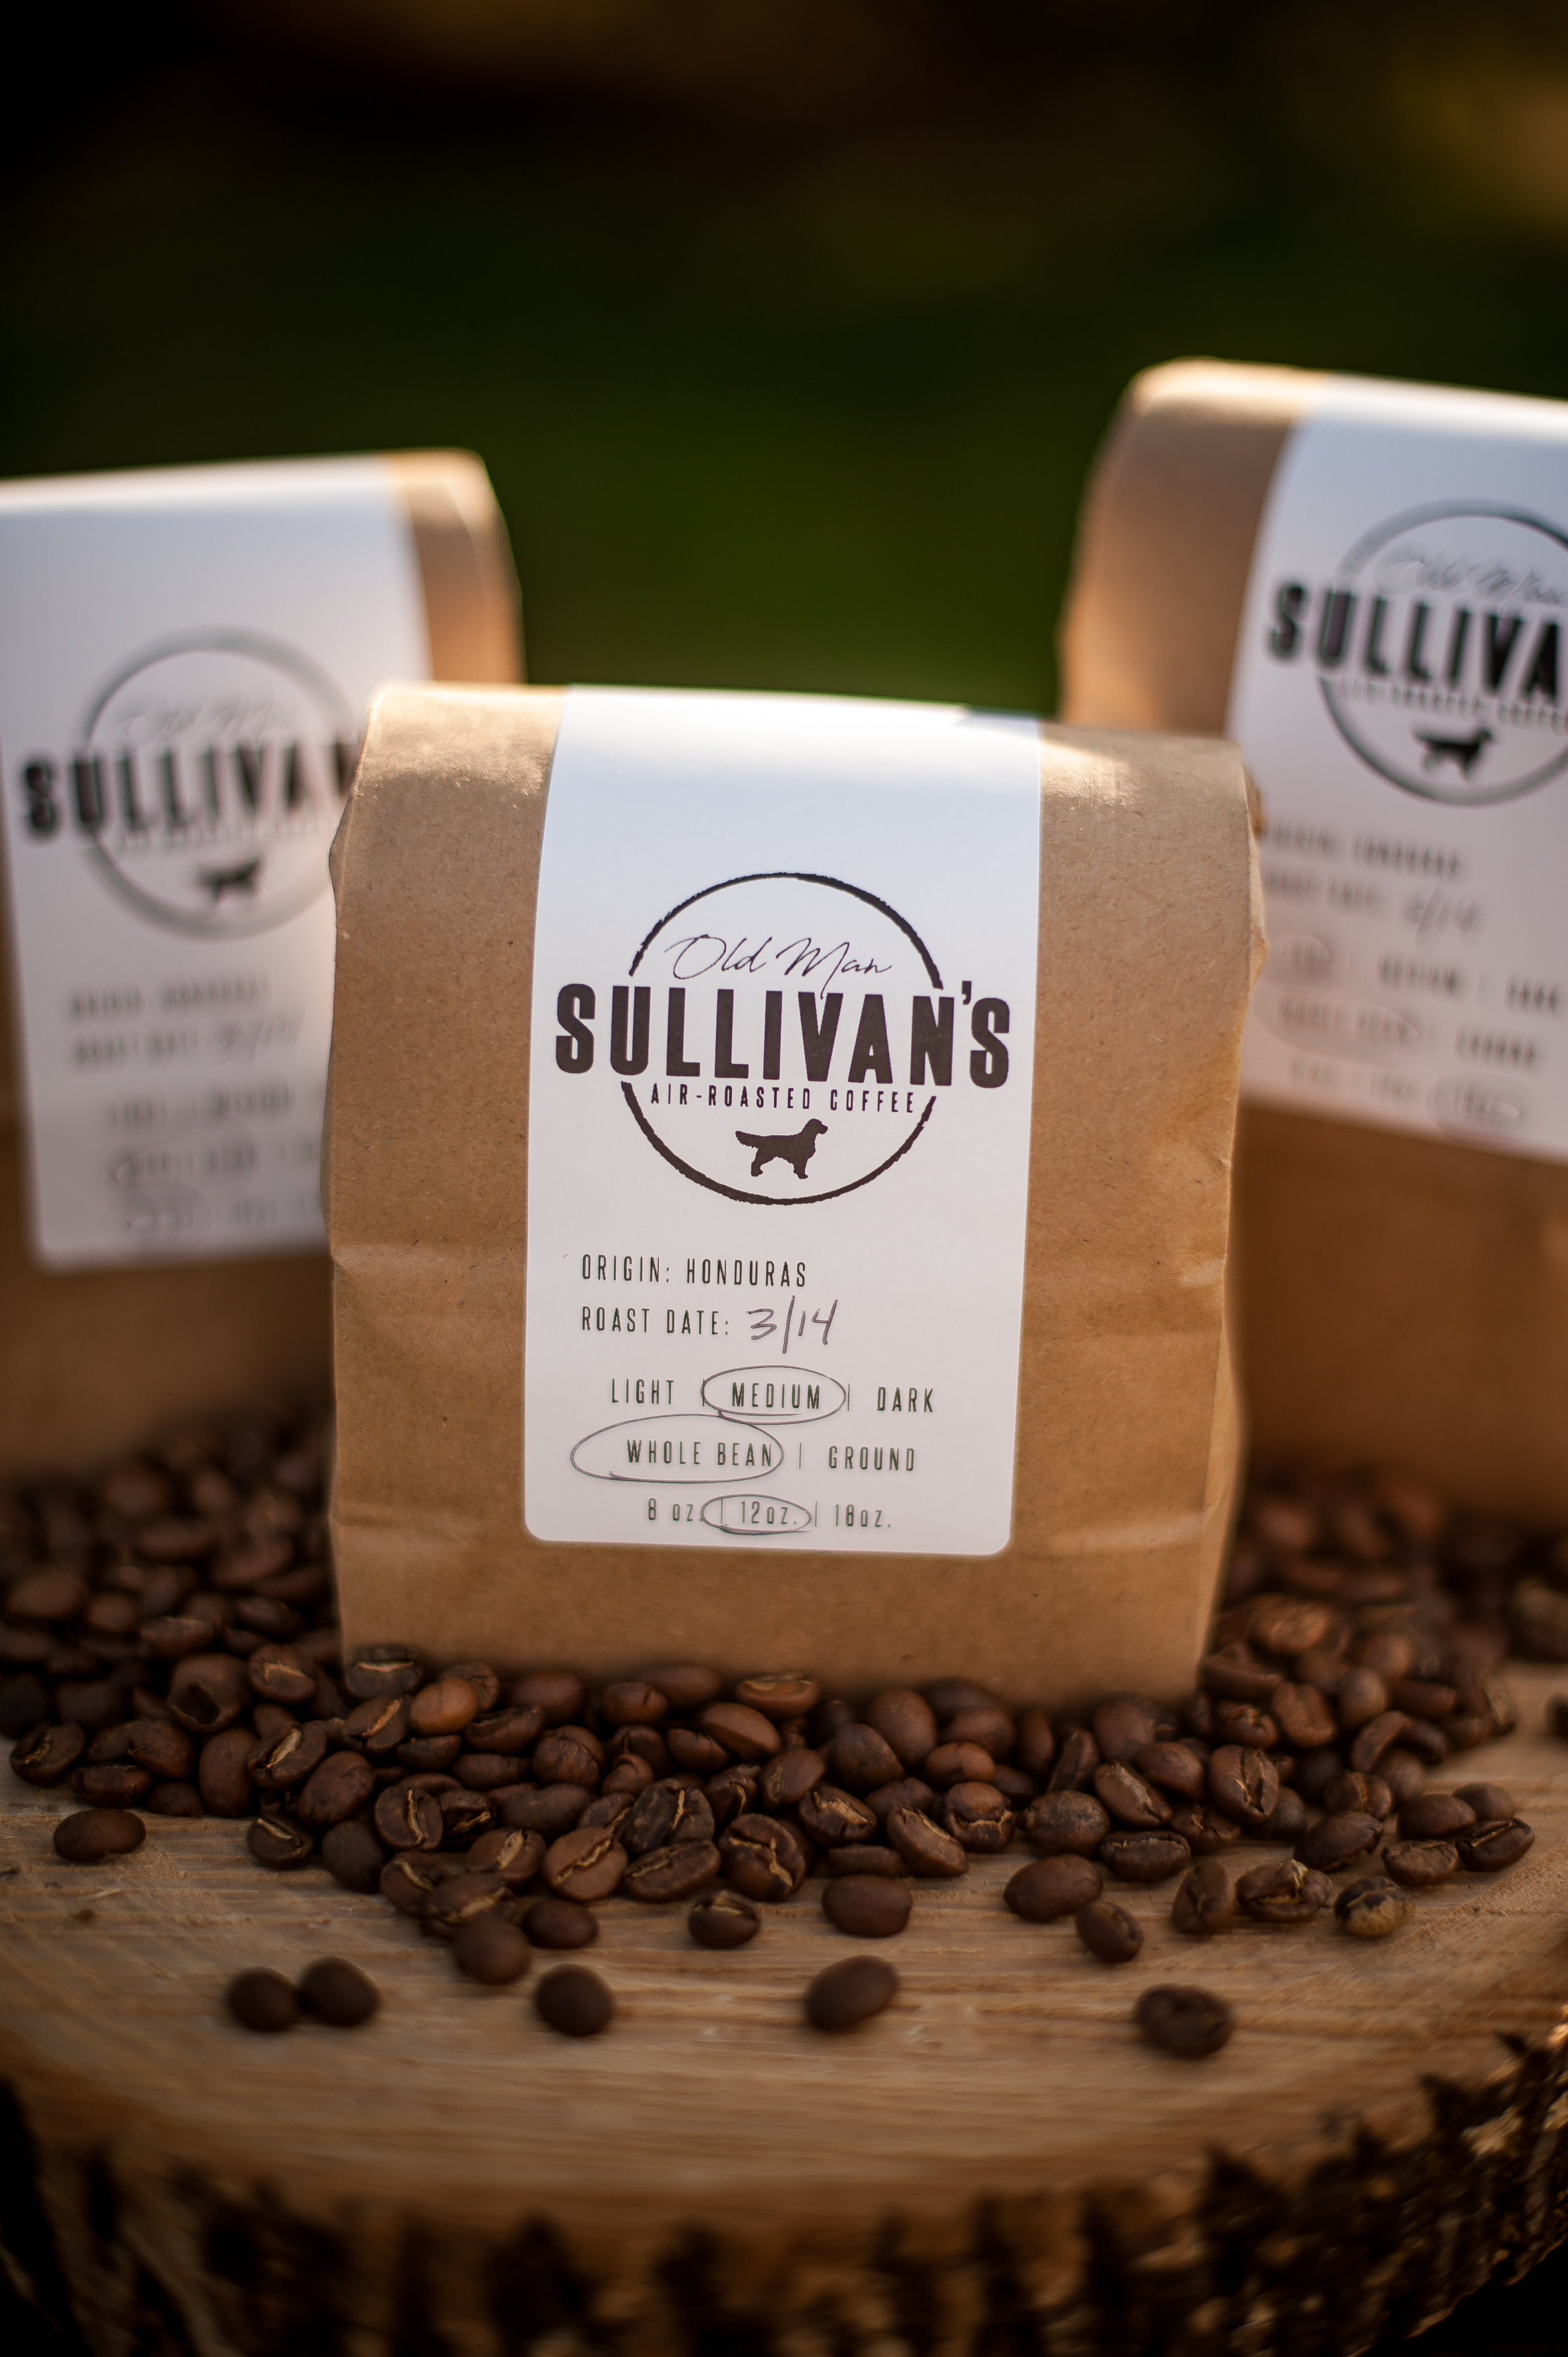 old_man_sullivans_coffee_co_jtp2019-26.jpg